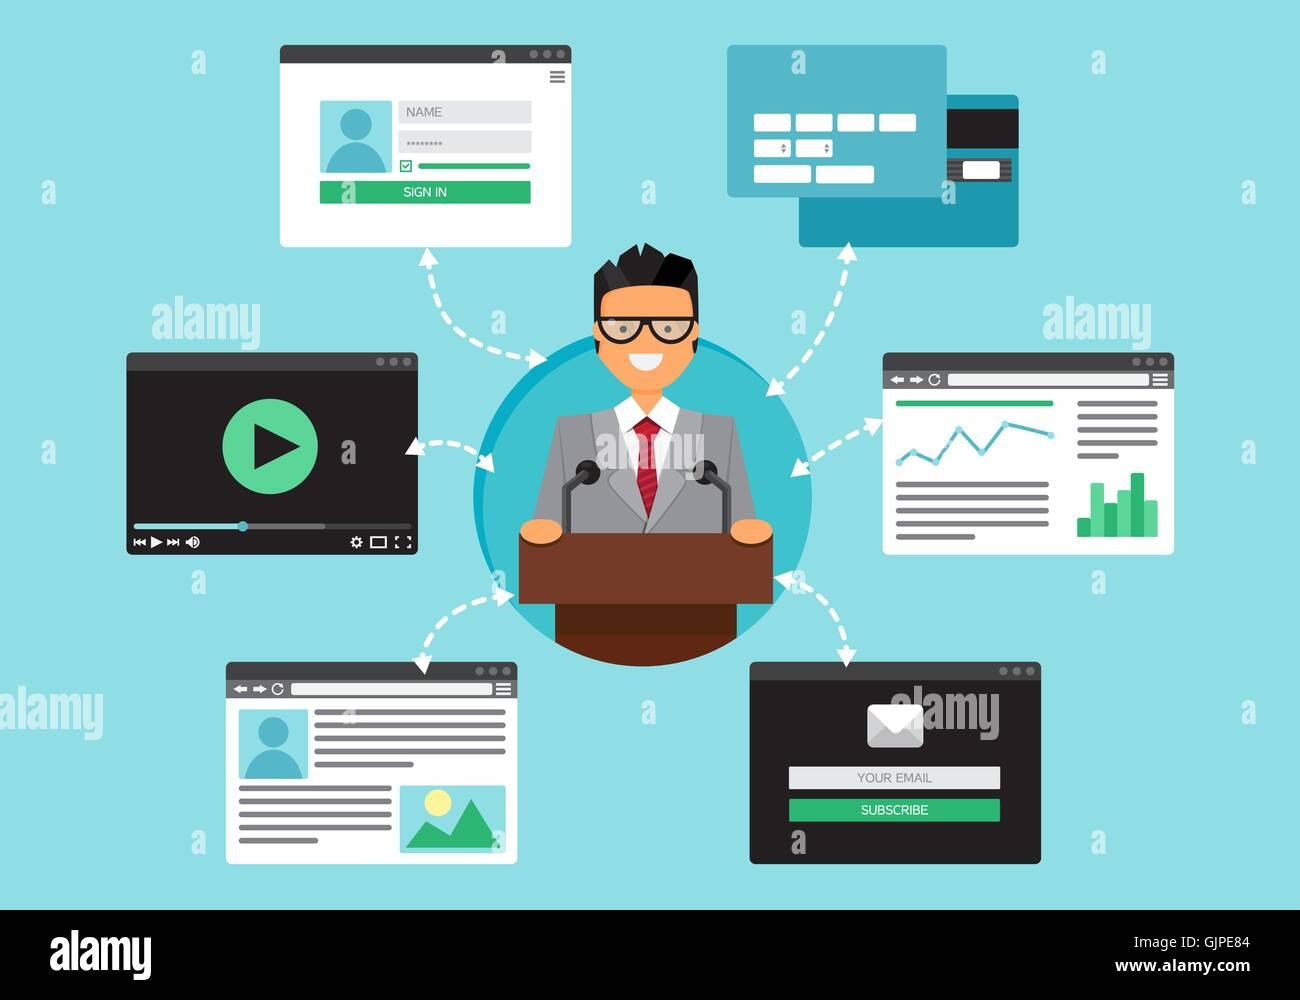 Web-Leben der Geschäftsmann aus Video, Blog, social Networks, Online ...